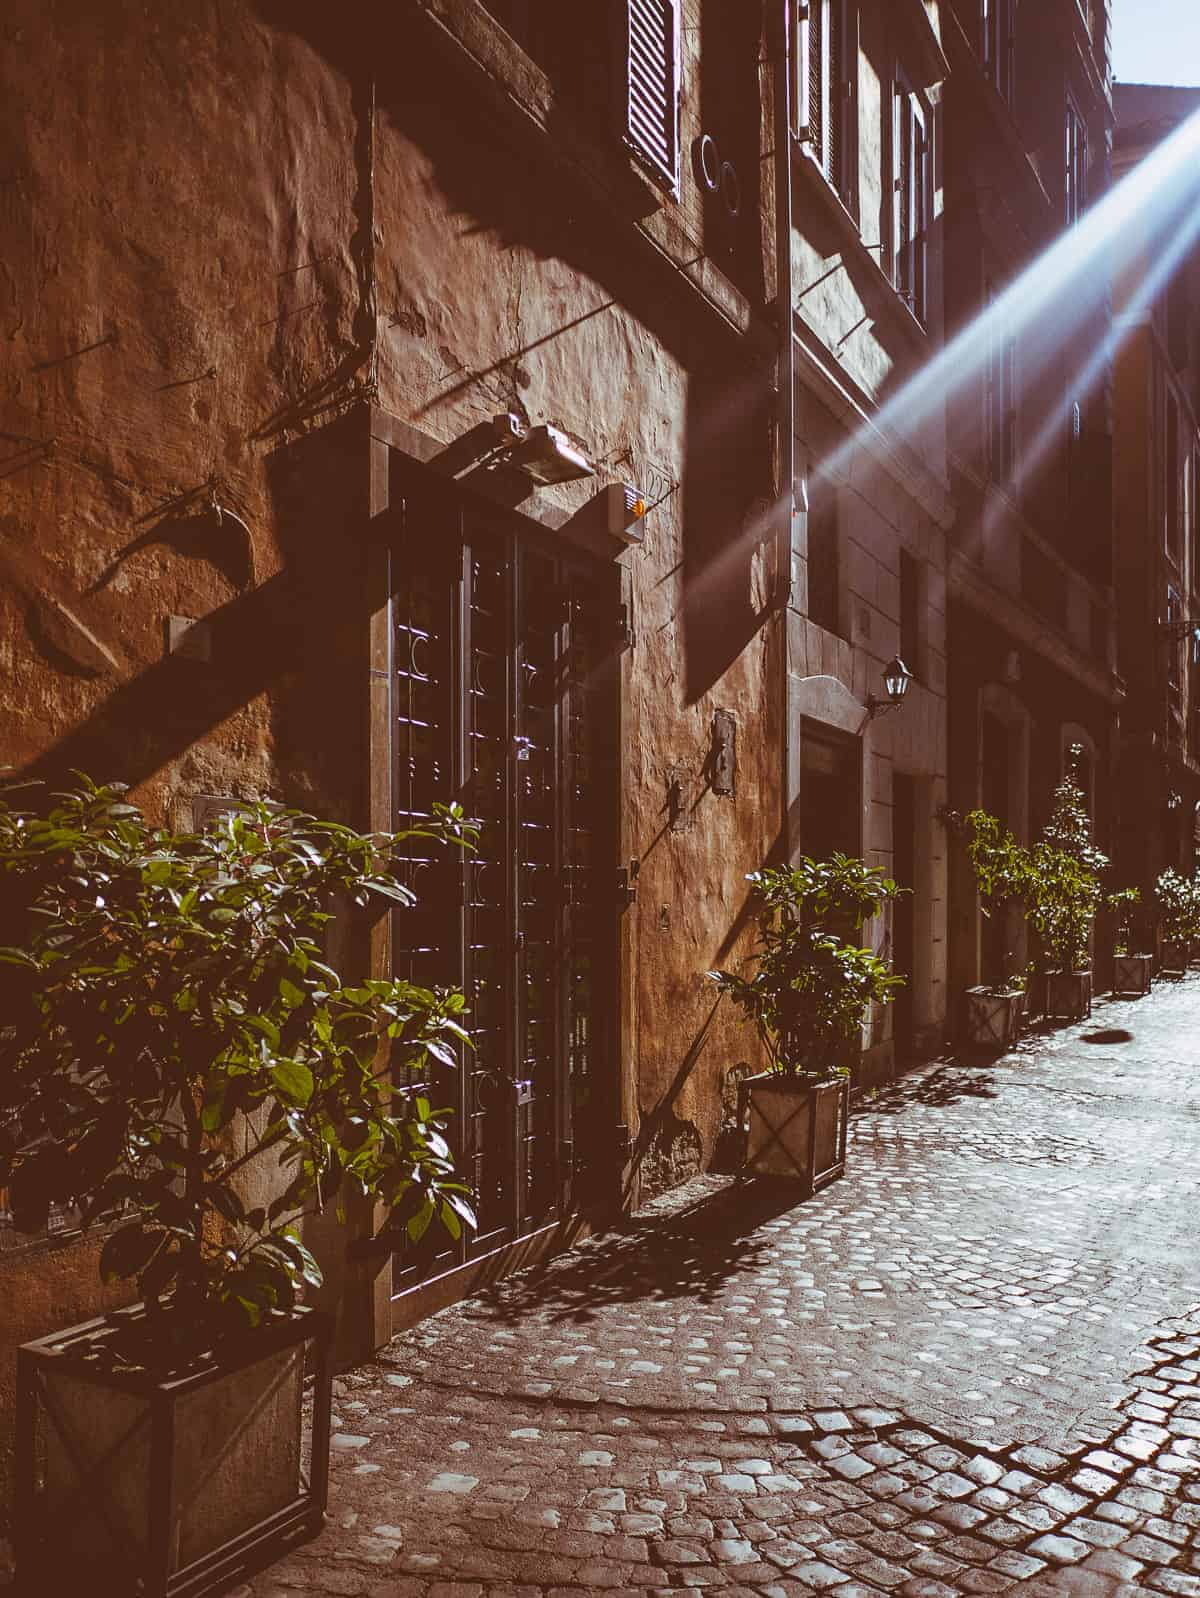 sunlit backstreets near Piazza Navona